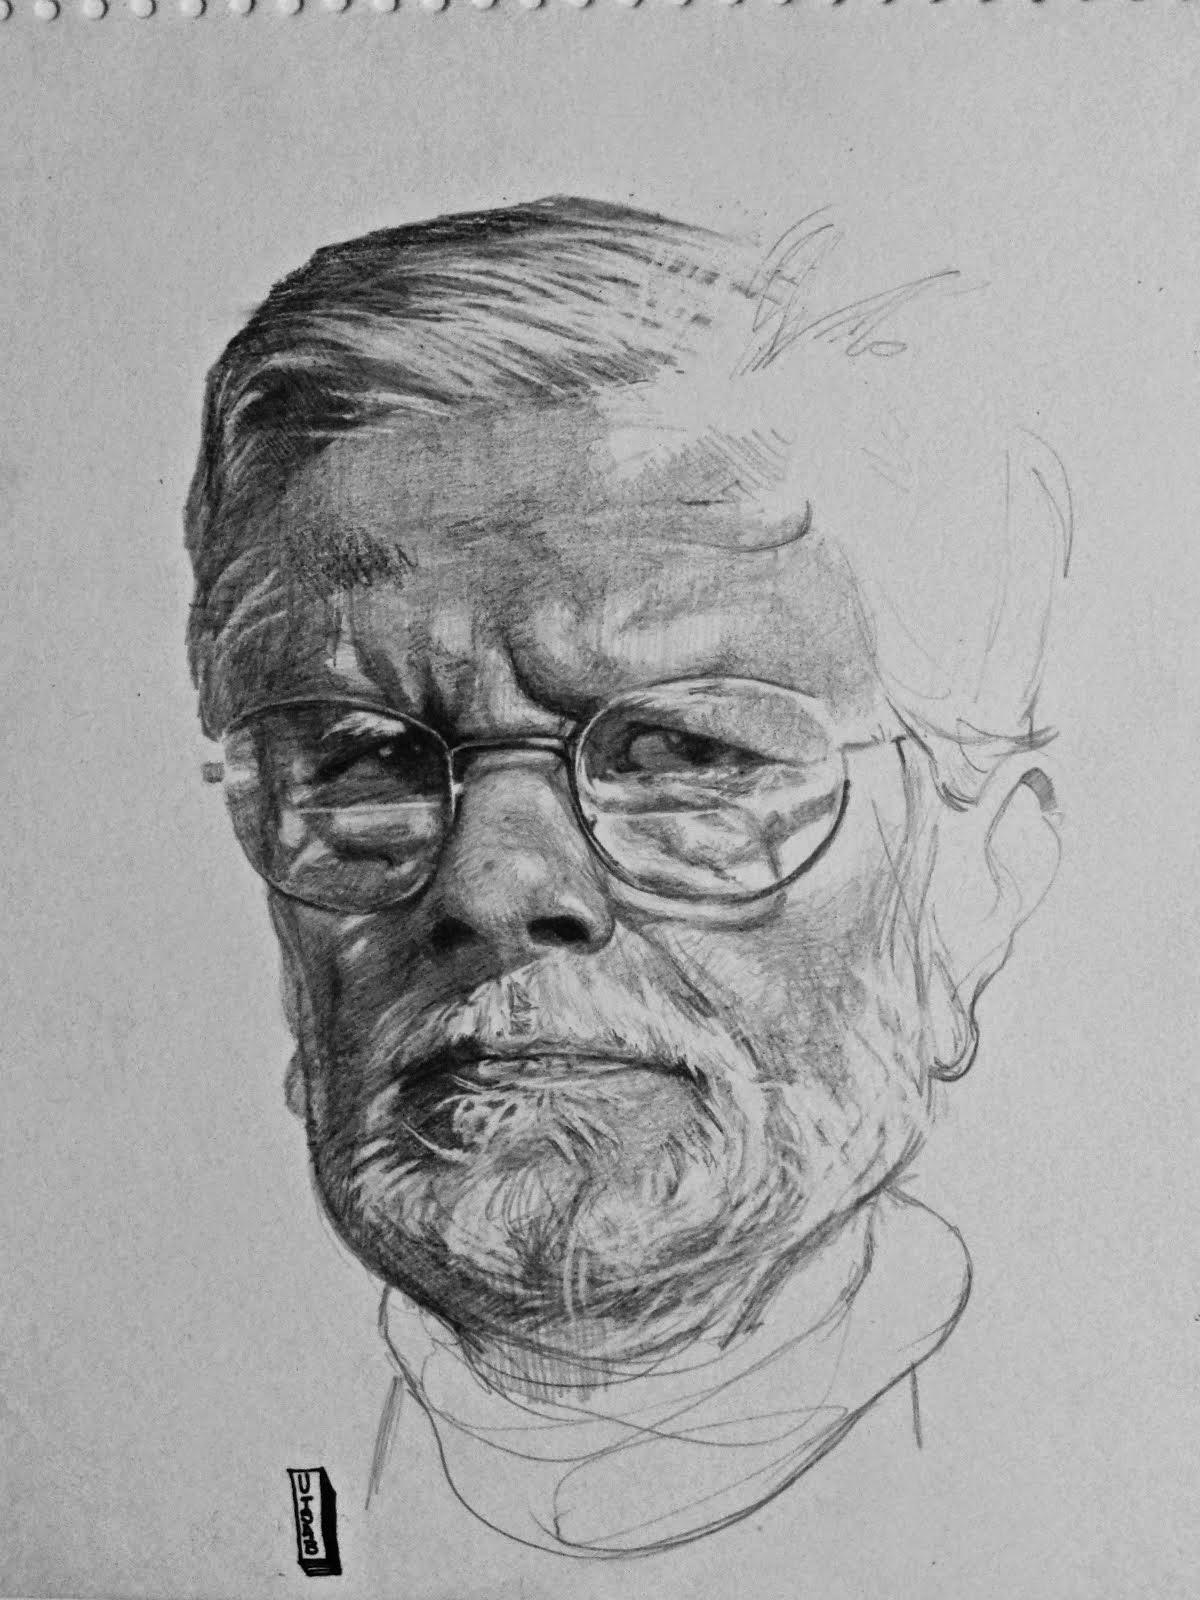 Drawn by Utsab Chatterjee